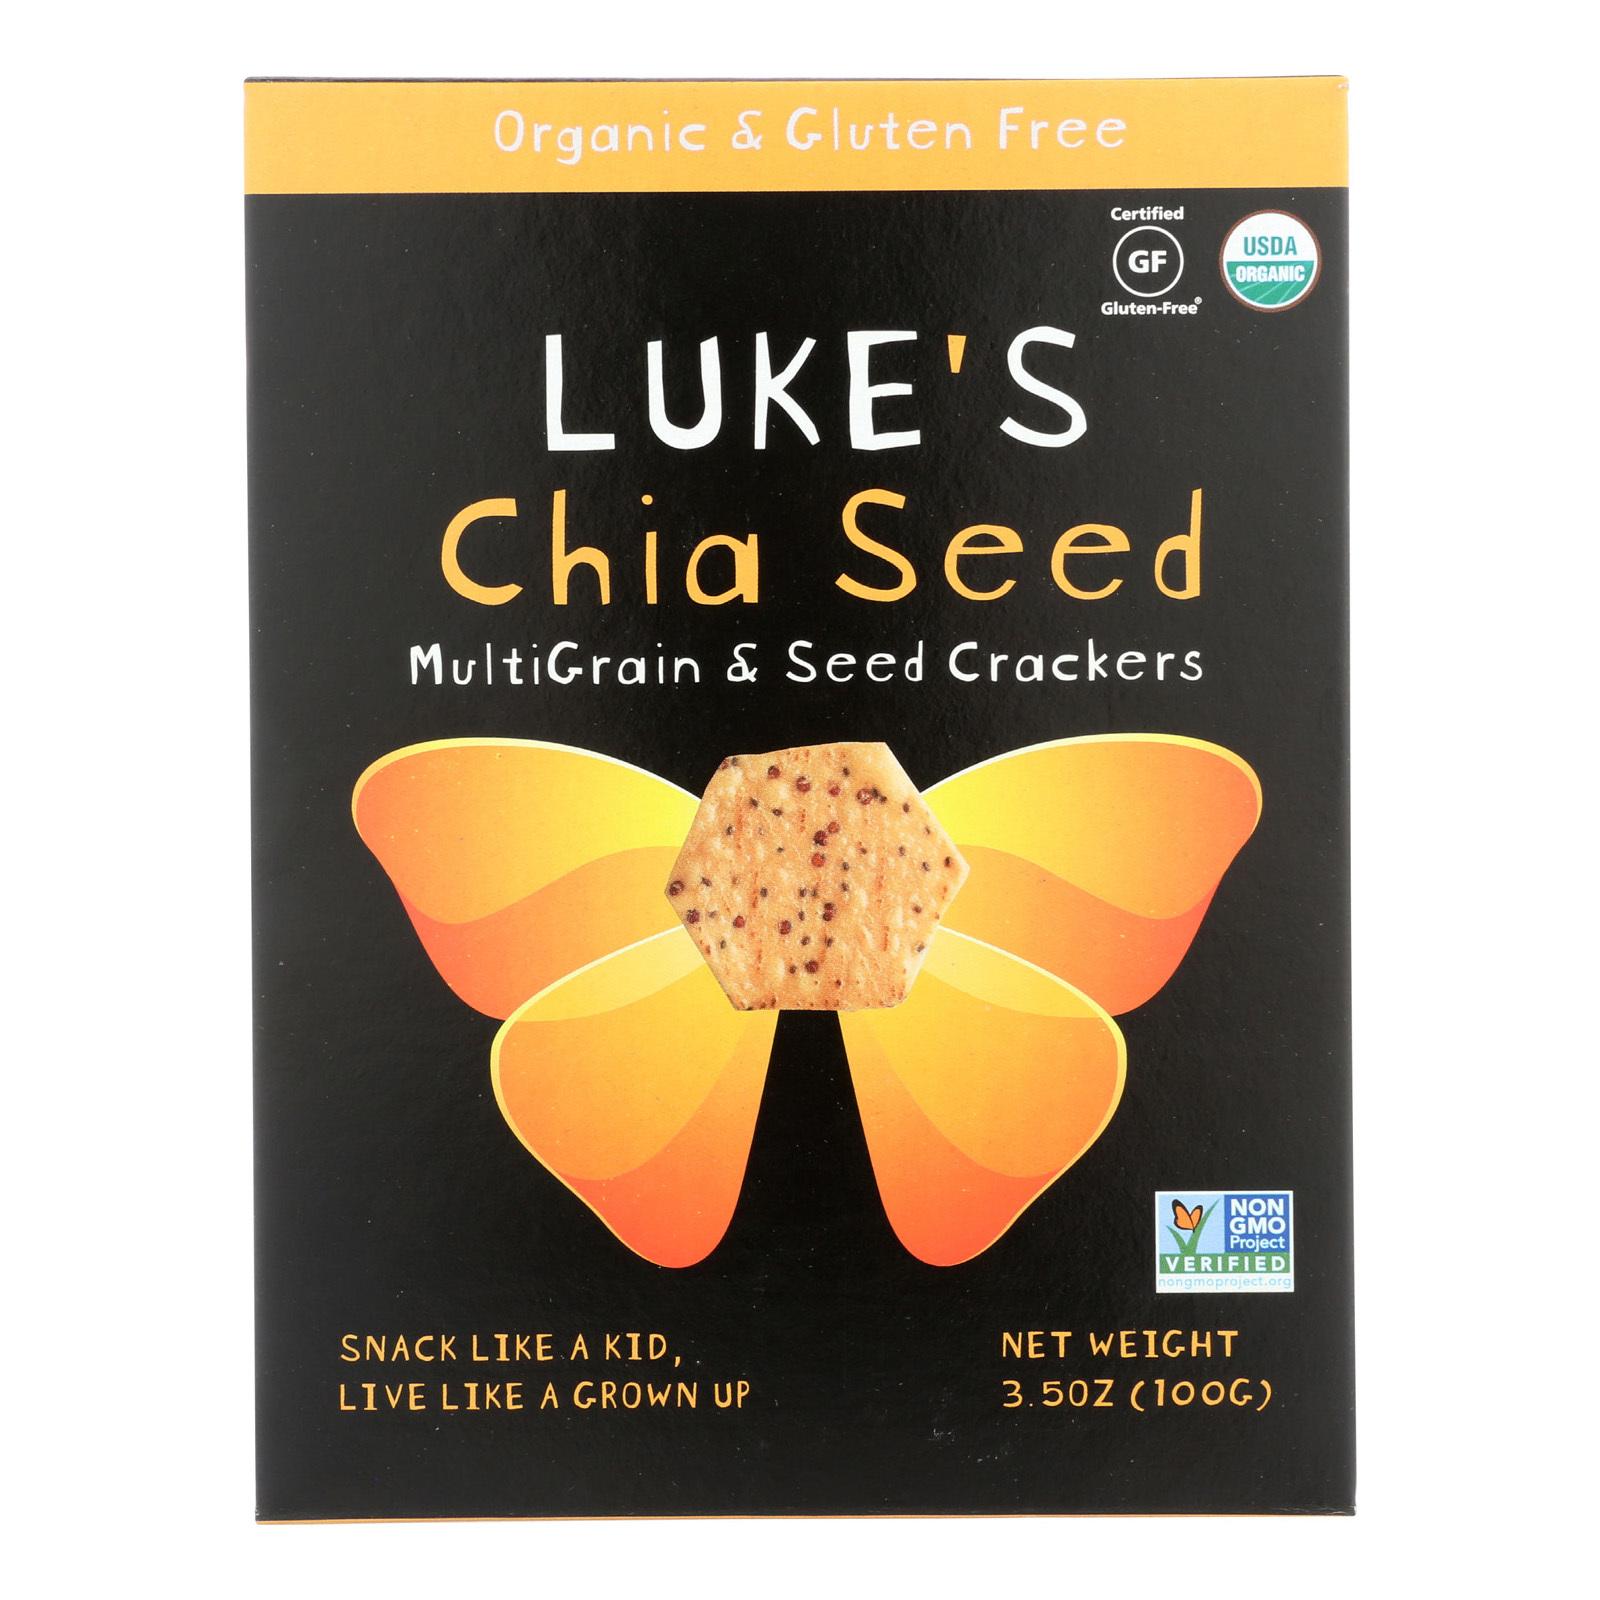 Luke's Organic Chia Seed Crackers - Multi Grain and Seeds - Case of 6 - 3.5 oz.